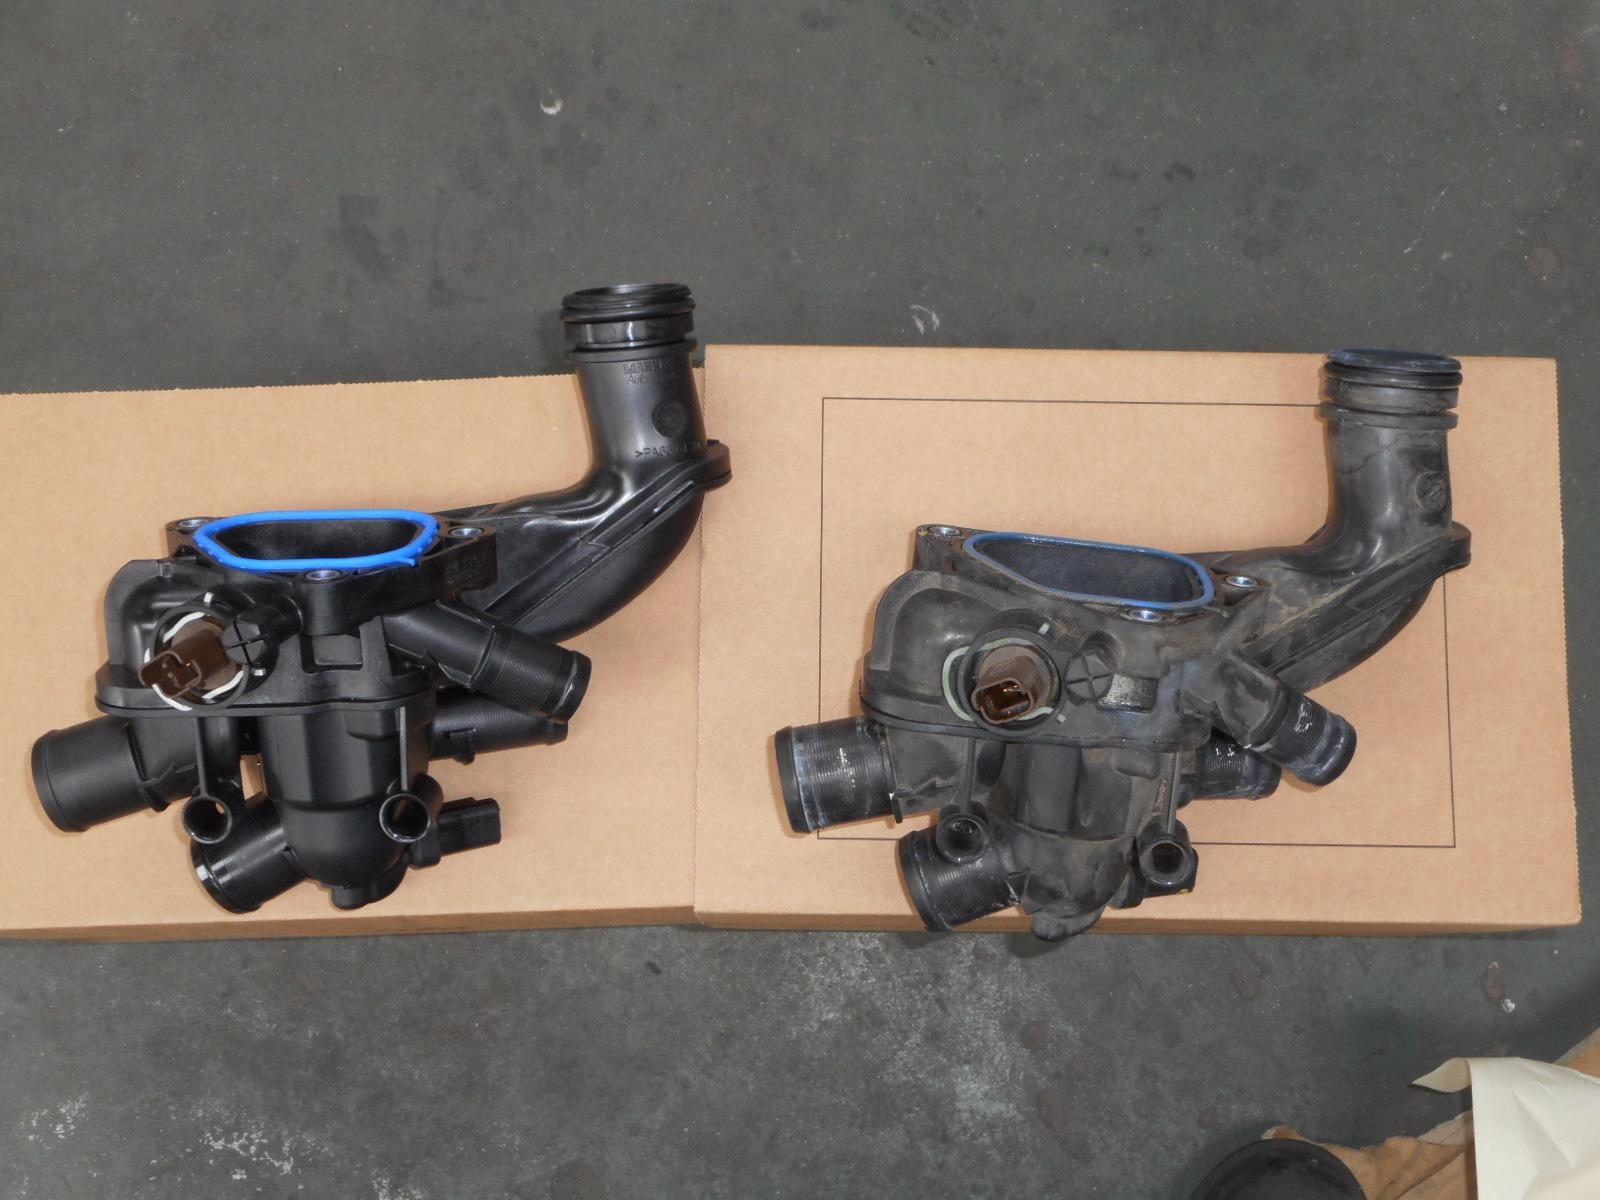 BMW MINI (R56) 冷却水漏れ 修理_c0267693_17150266.jpg